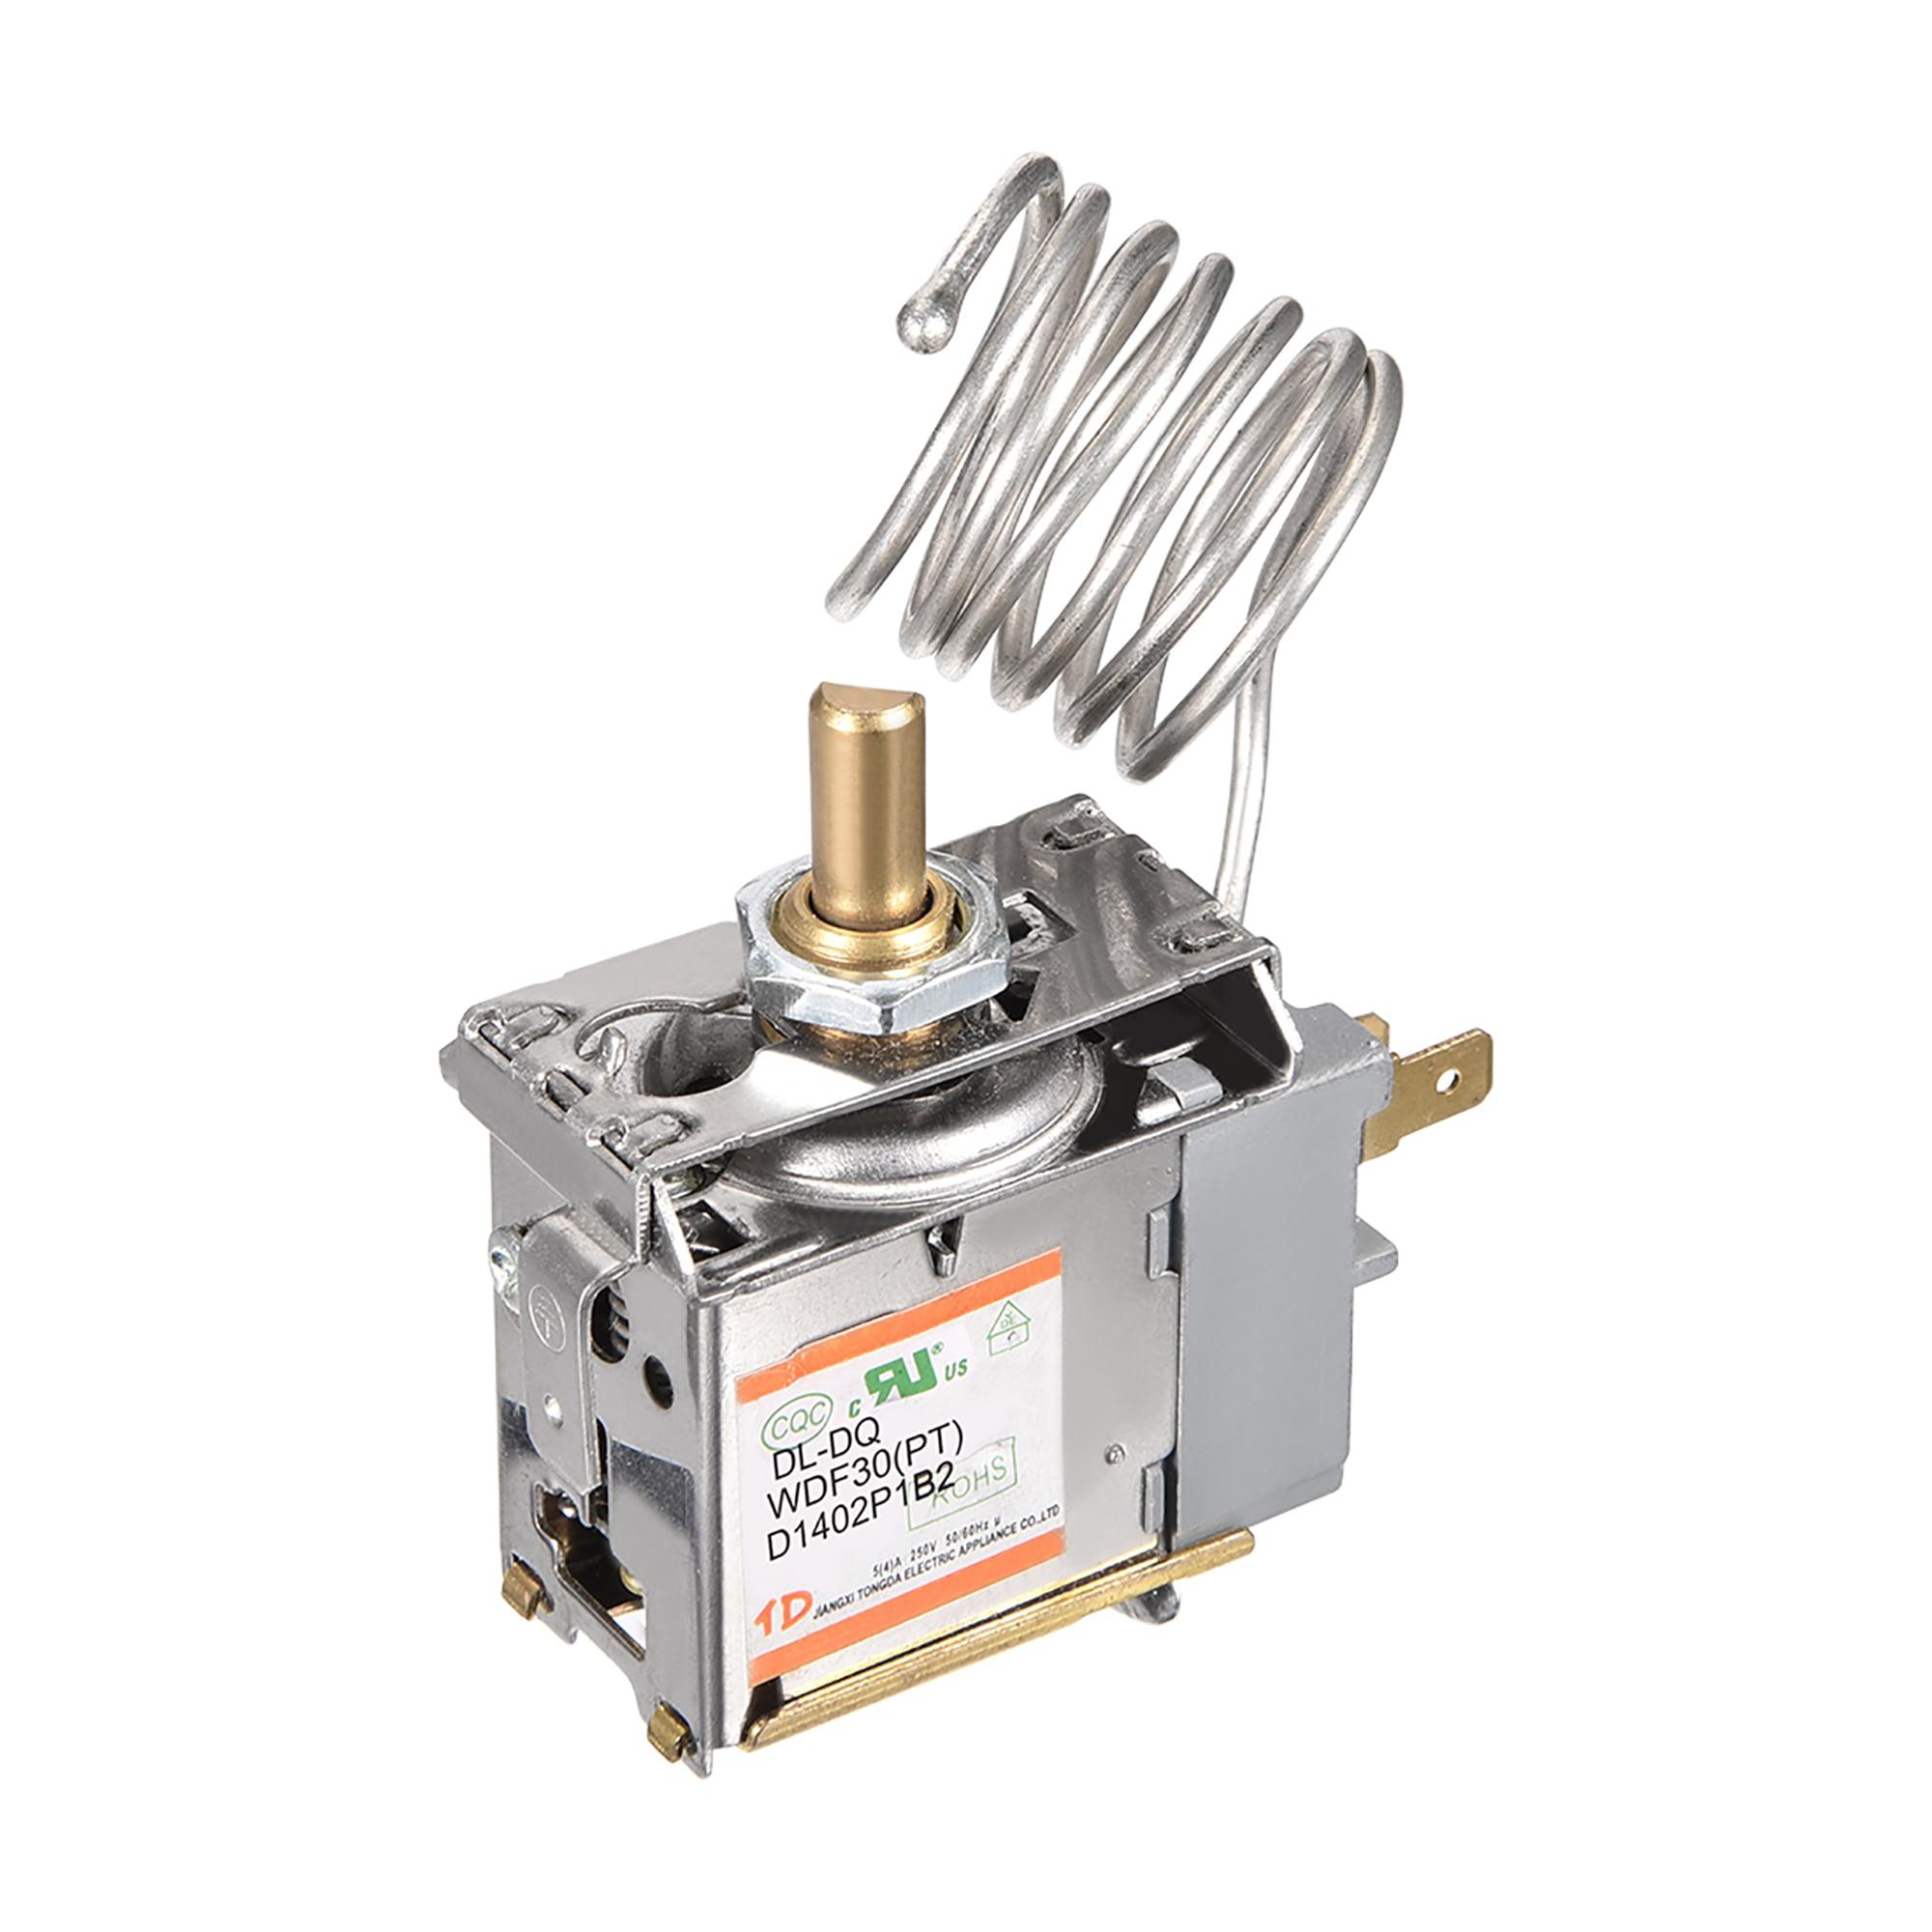 Refrigerator Thermostat Cord Freezer Refrigeration Temperature Controller 2 Pin 5(4)A